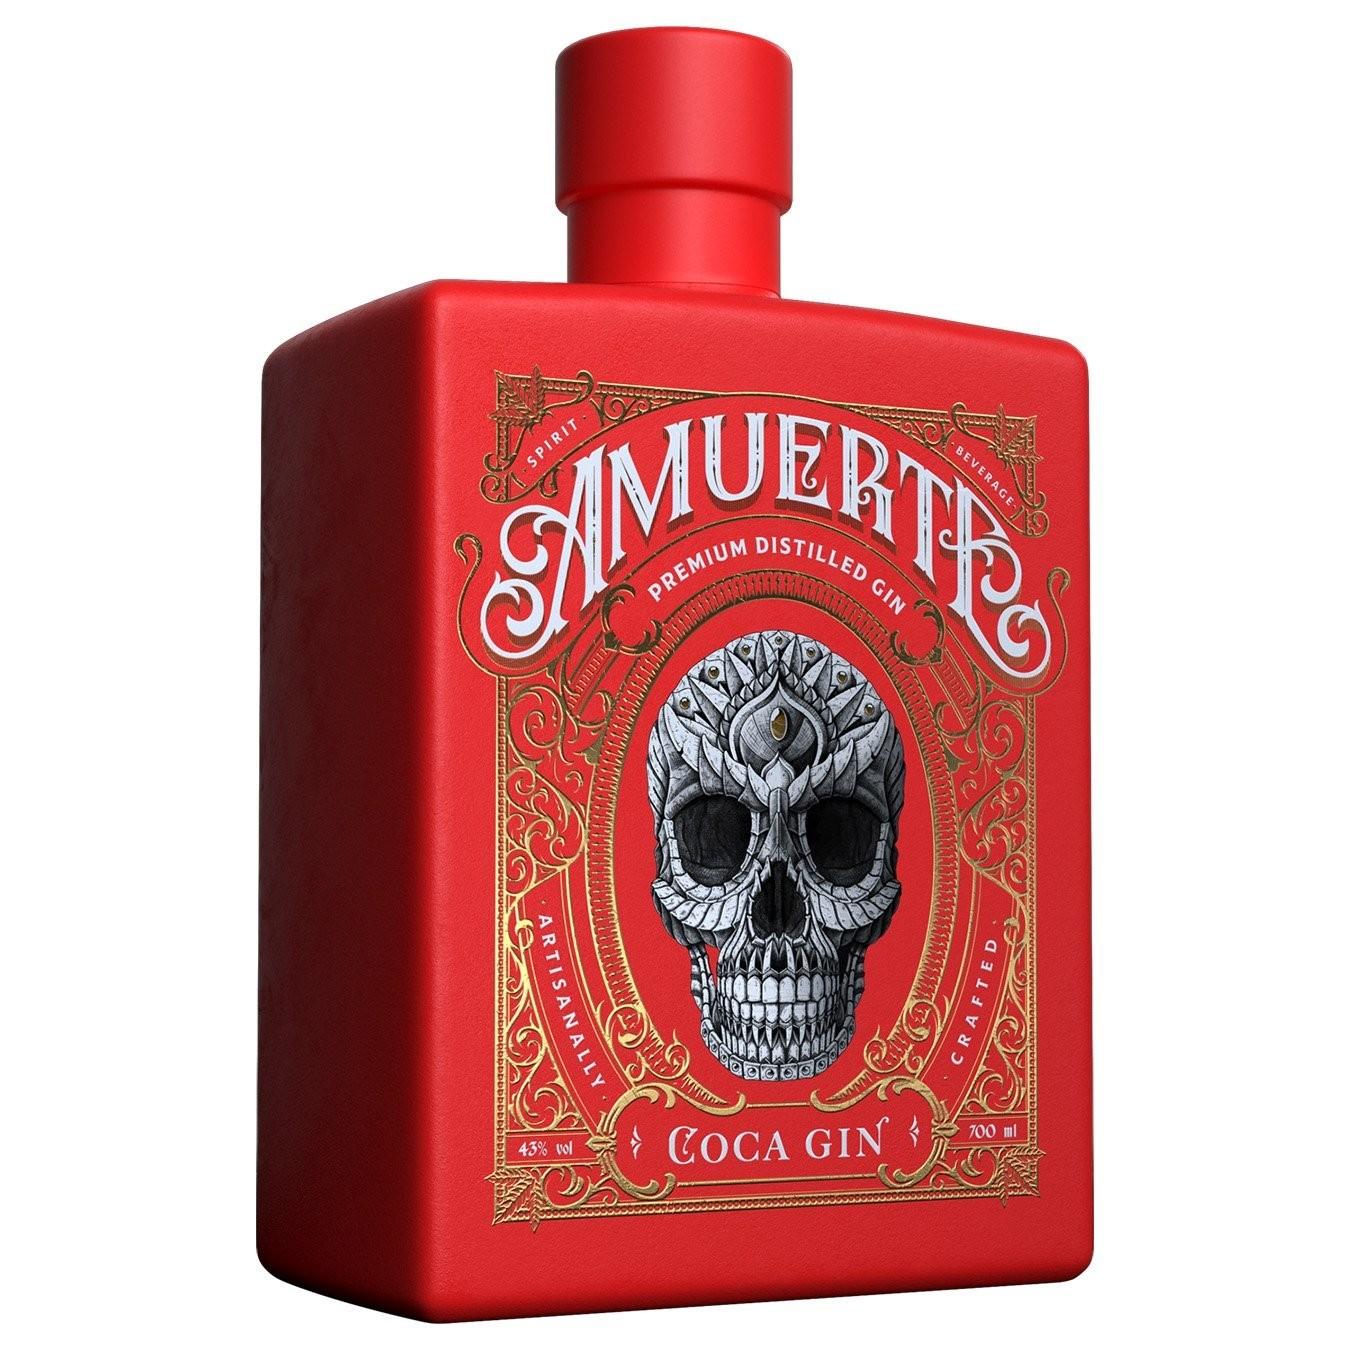 Amuerte - RED Edition gin...